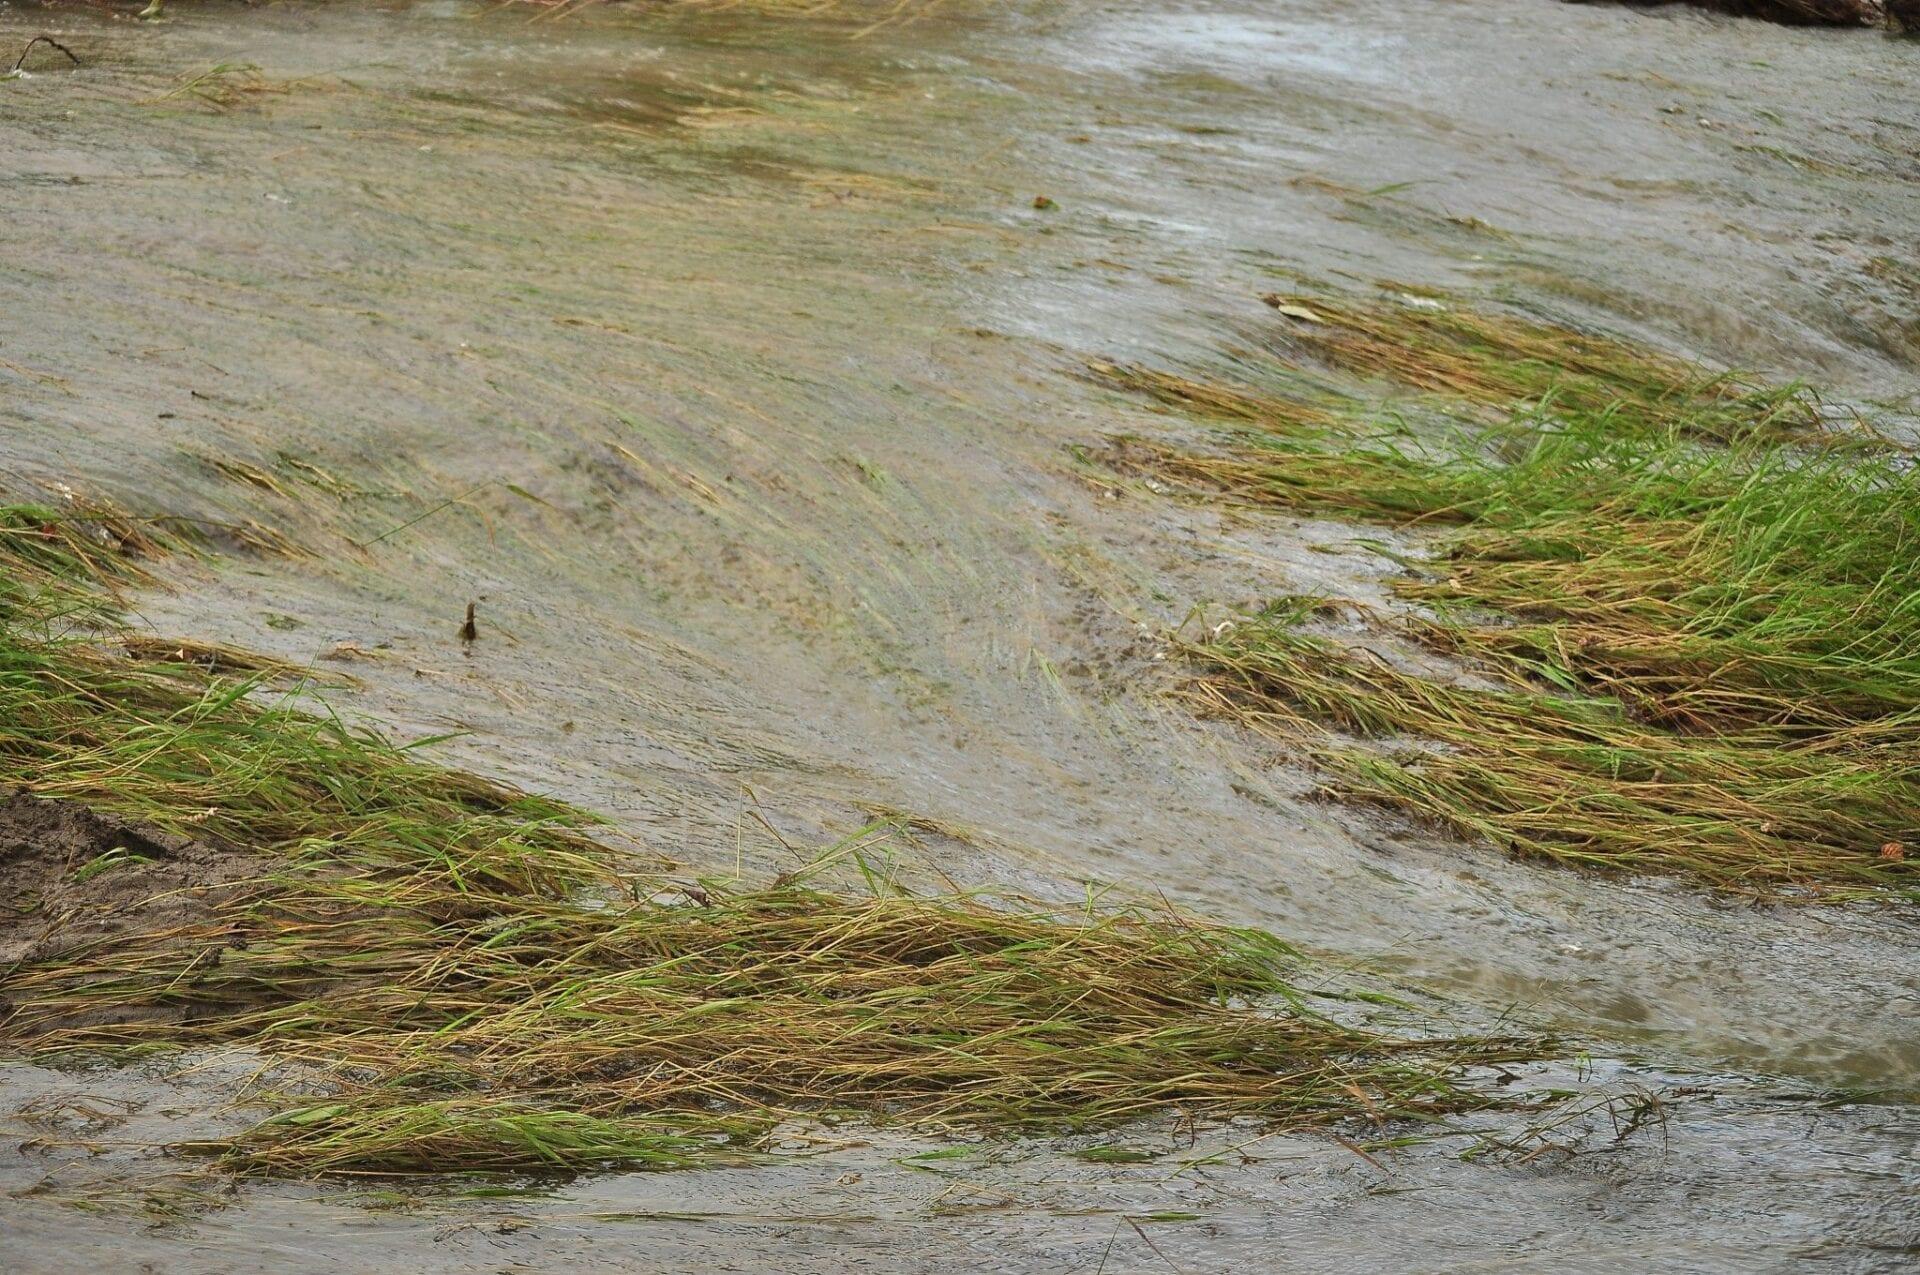 calgary-flood fishcreek- fish creek (7)